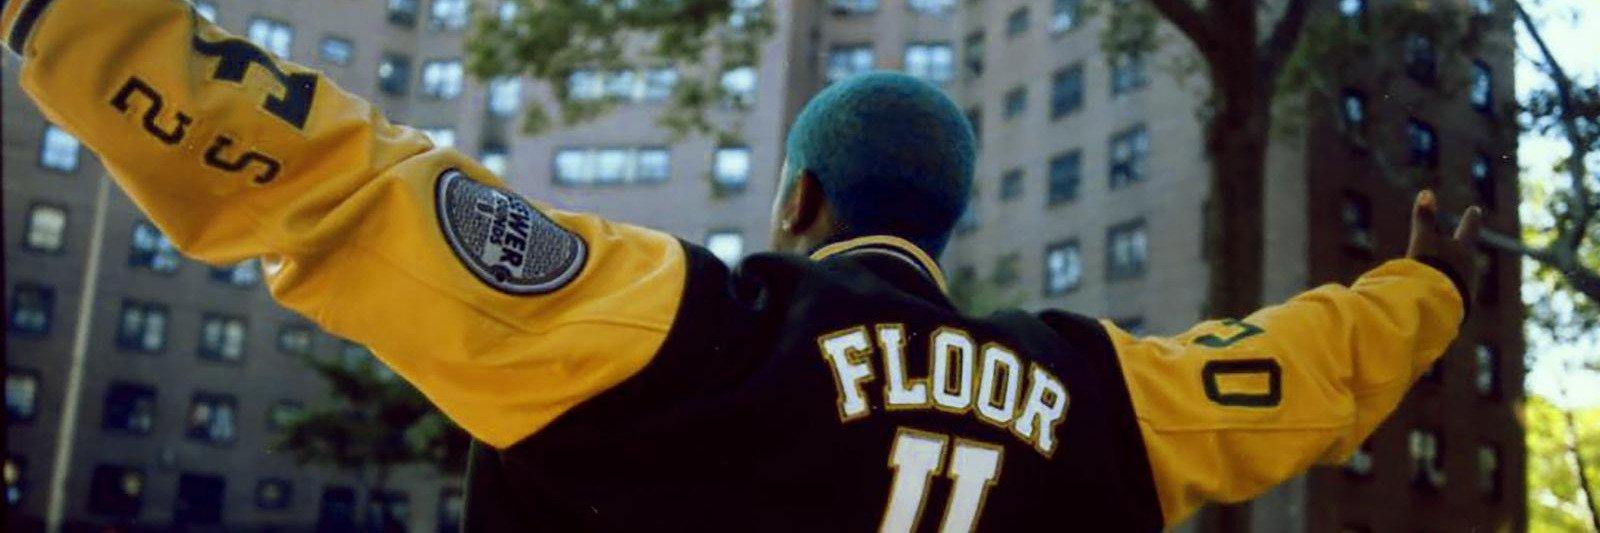 A$AP Ferg z sequelem Floor Seats